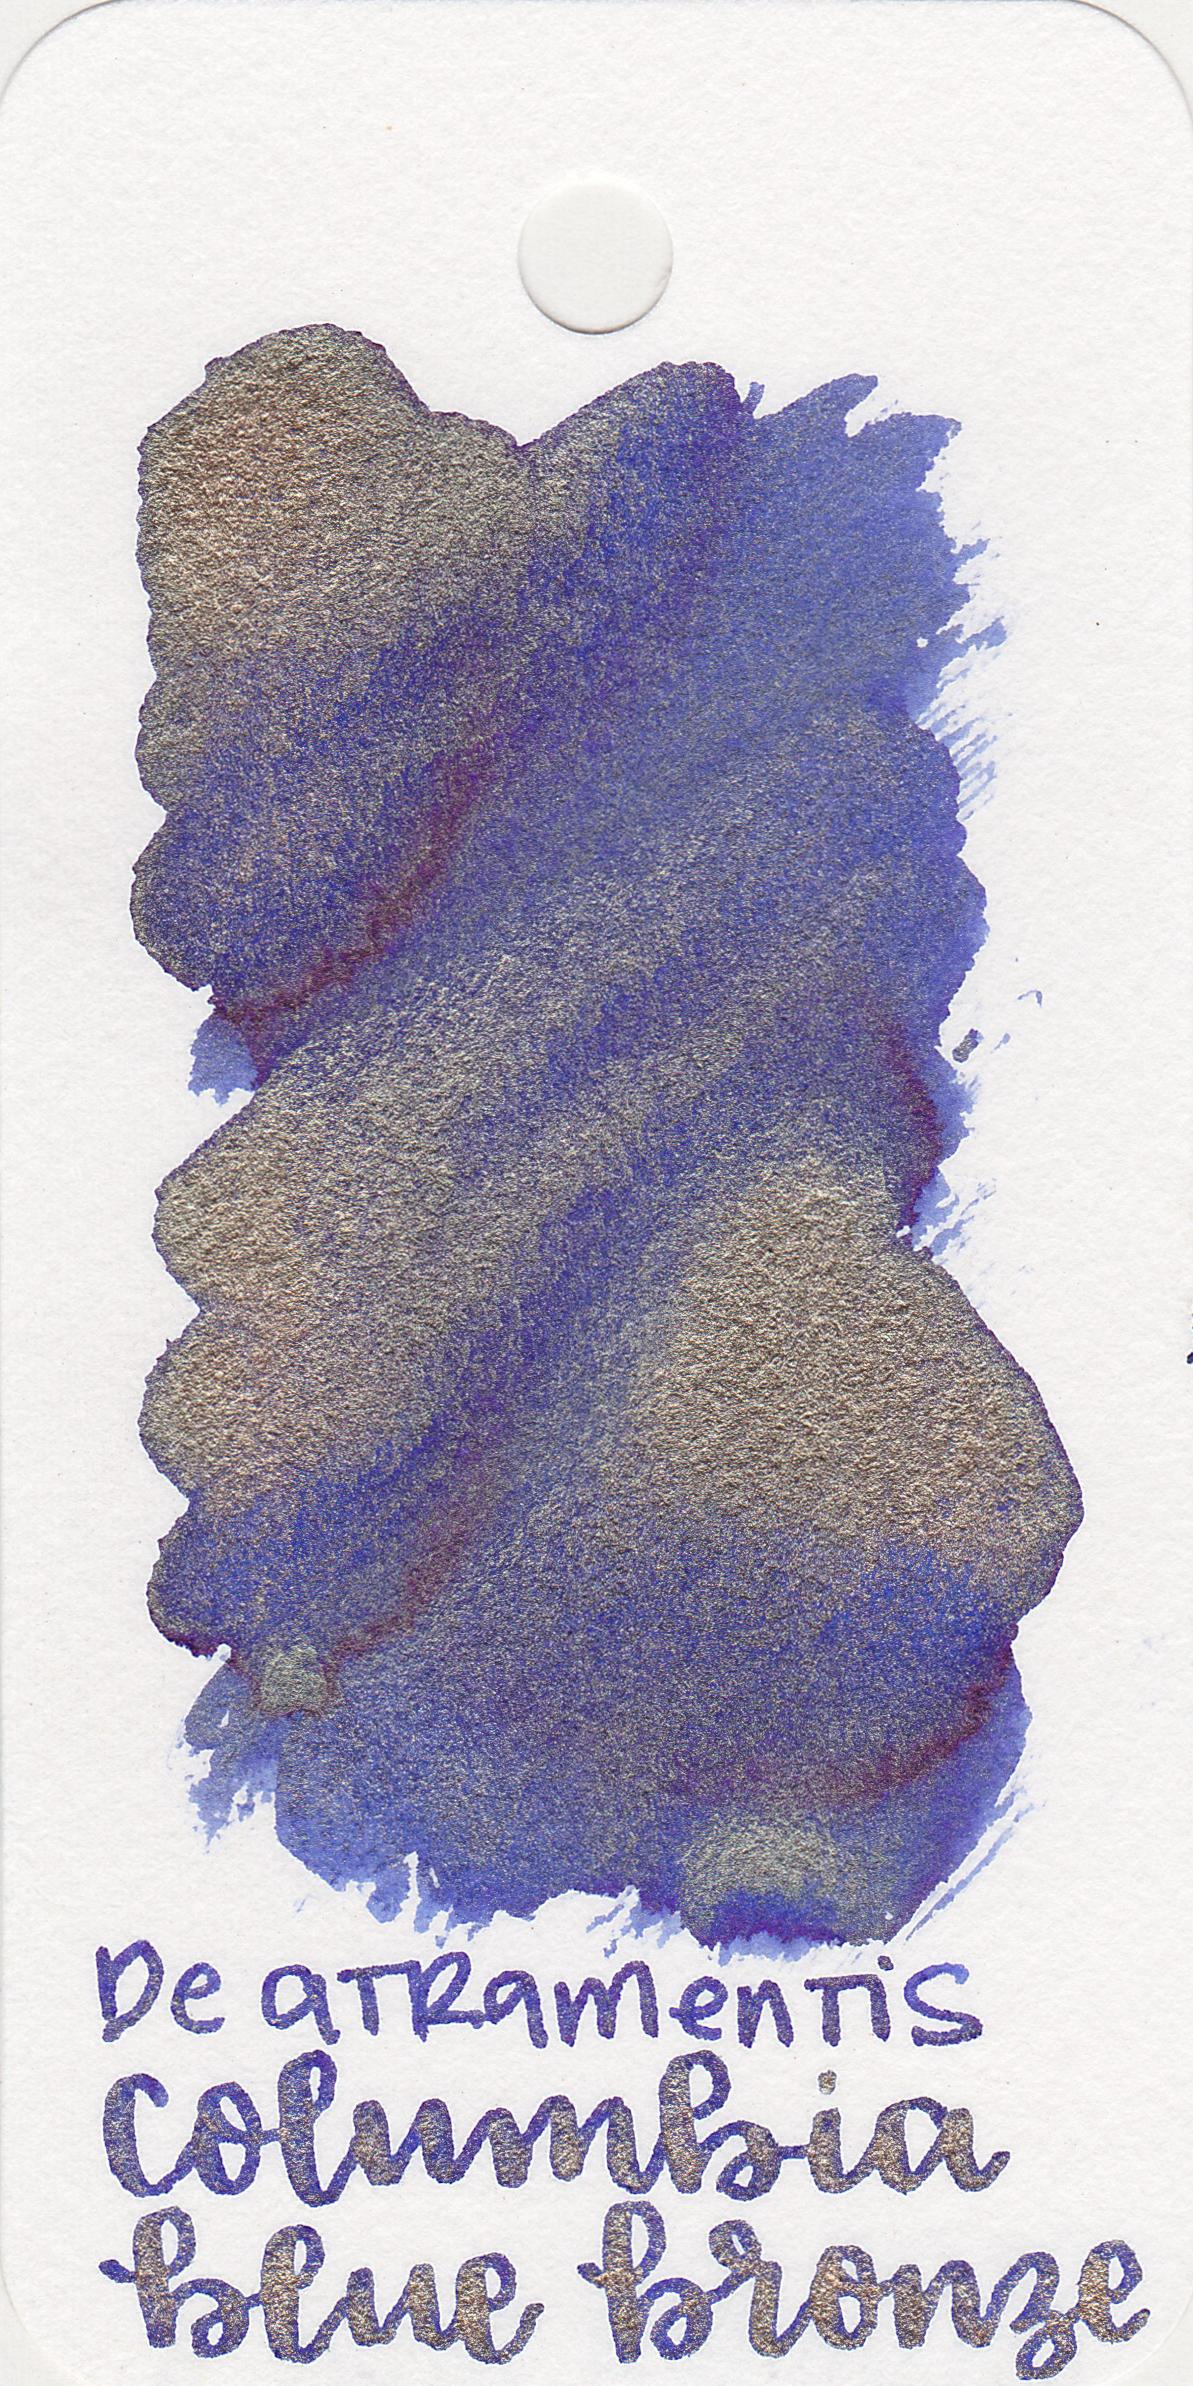 da-columbia-blue-4.jpg